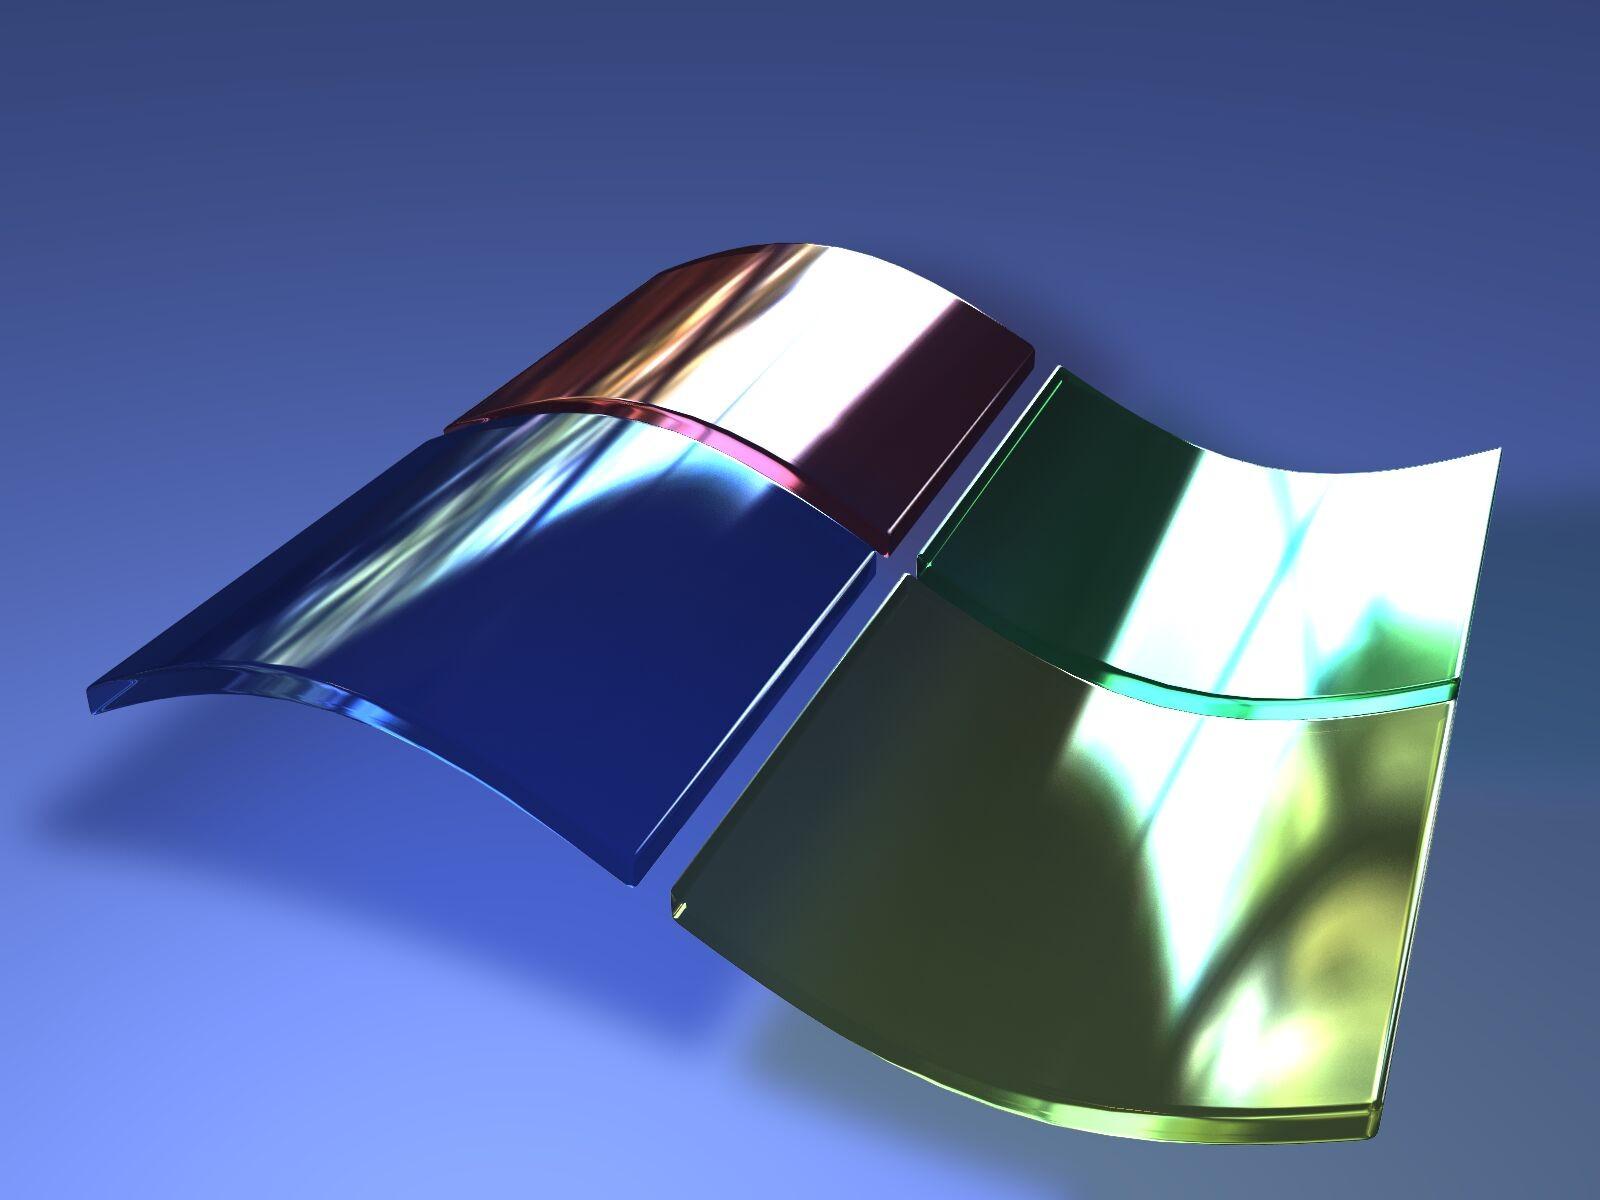 Wallpaper belle couleurs Theme Windows XP